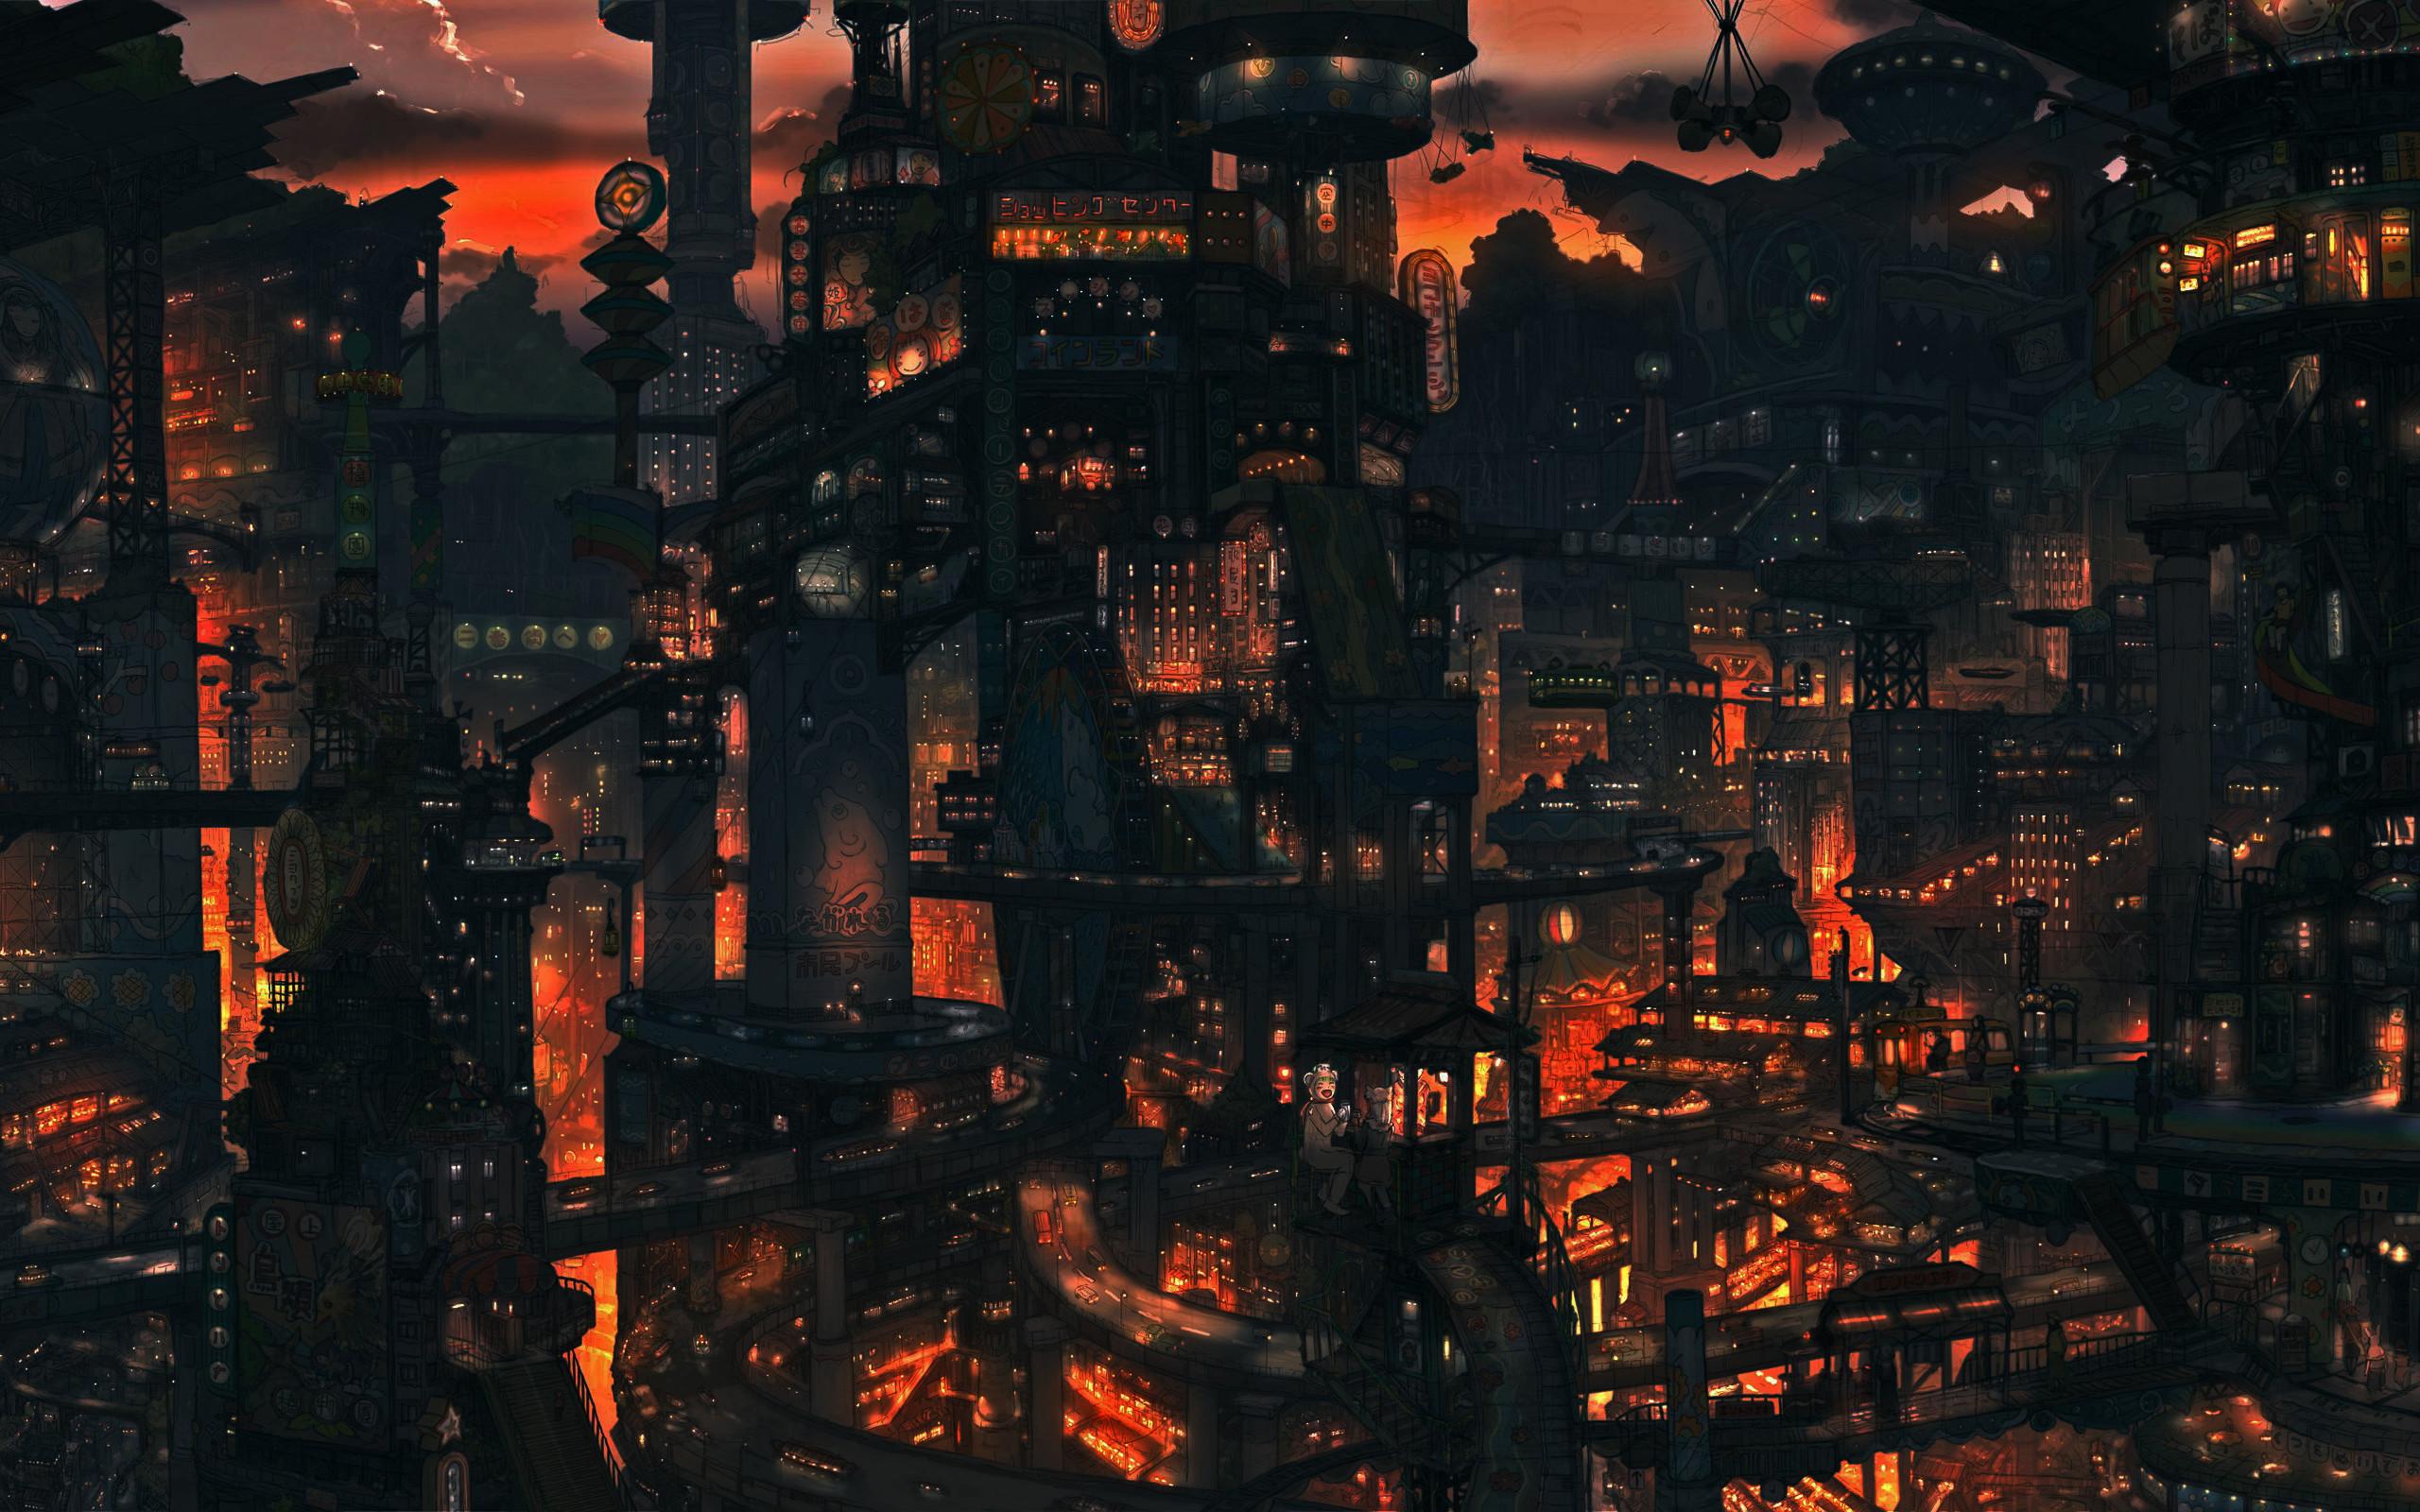 Awesome Steampunk Wallpaper 1627 2560 x 1600 .